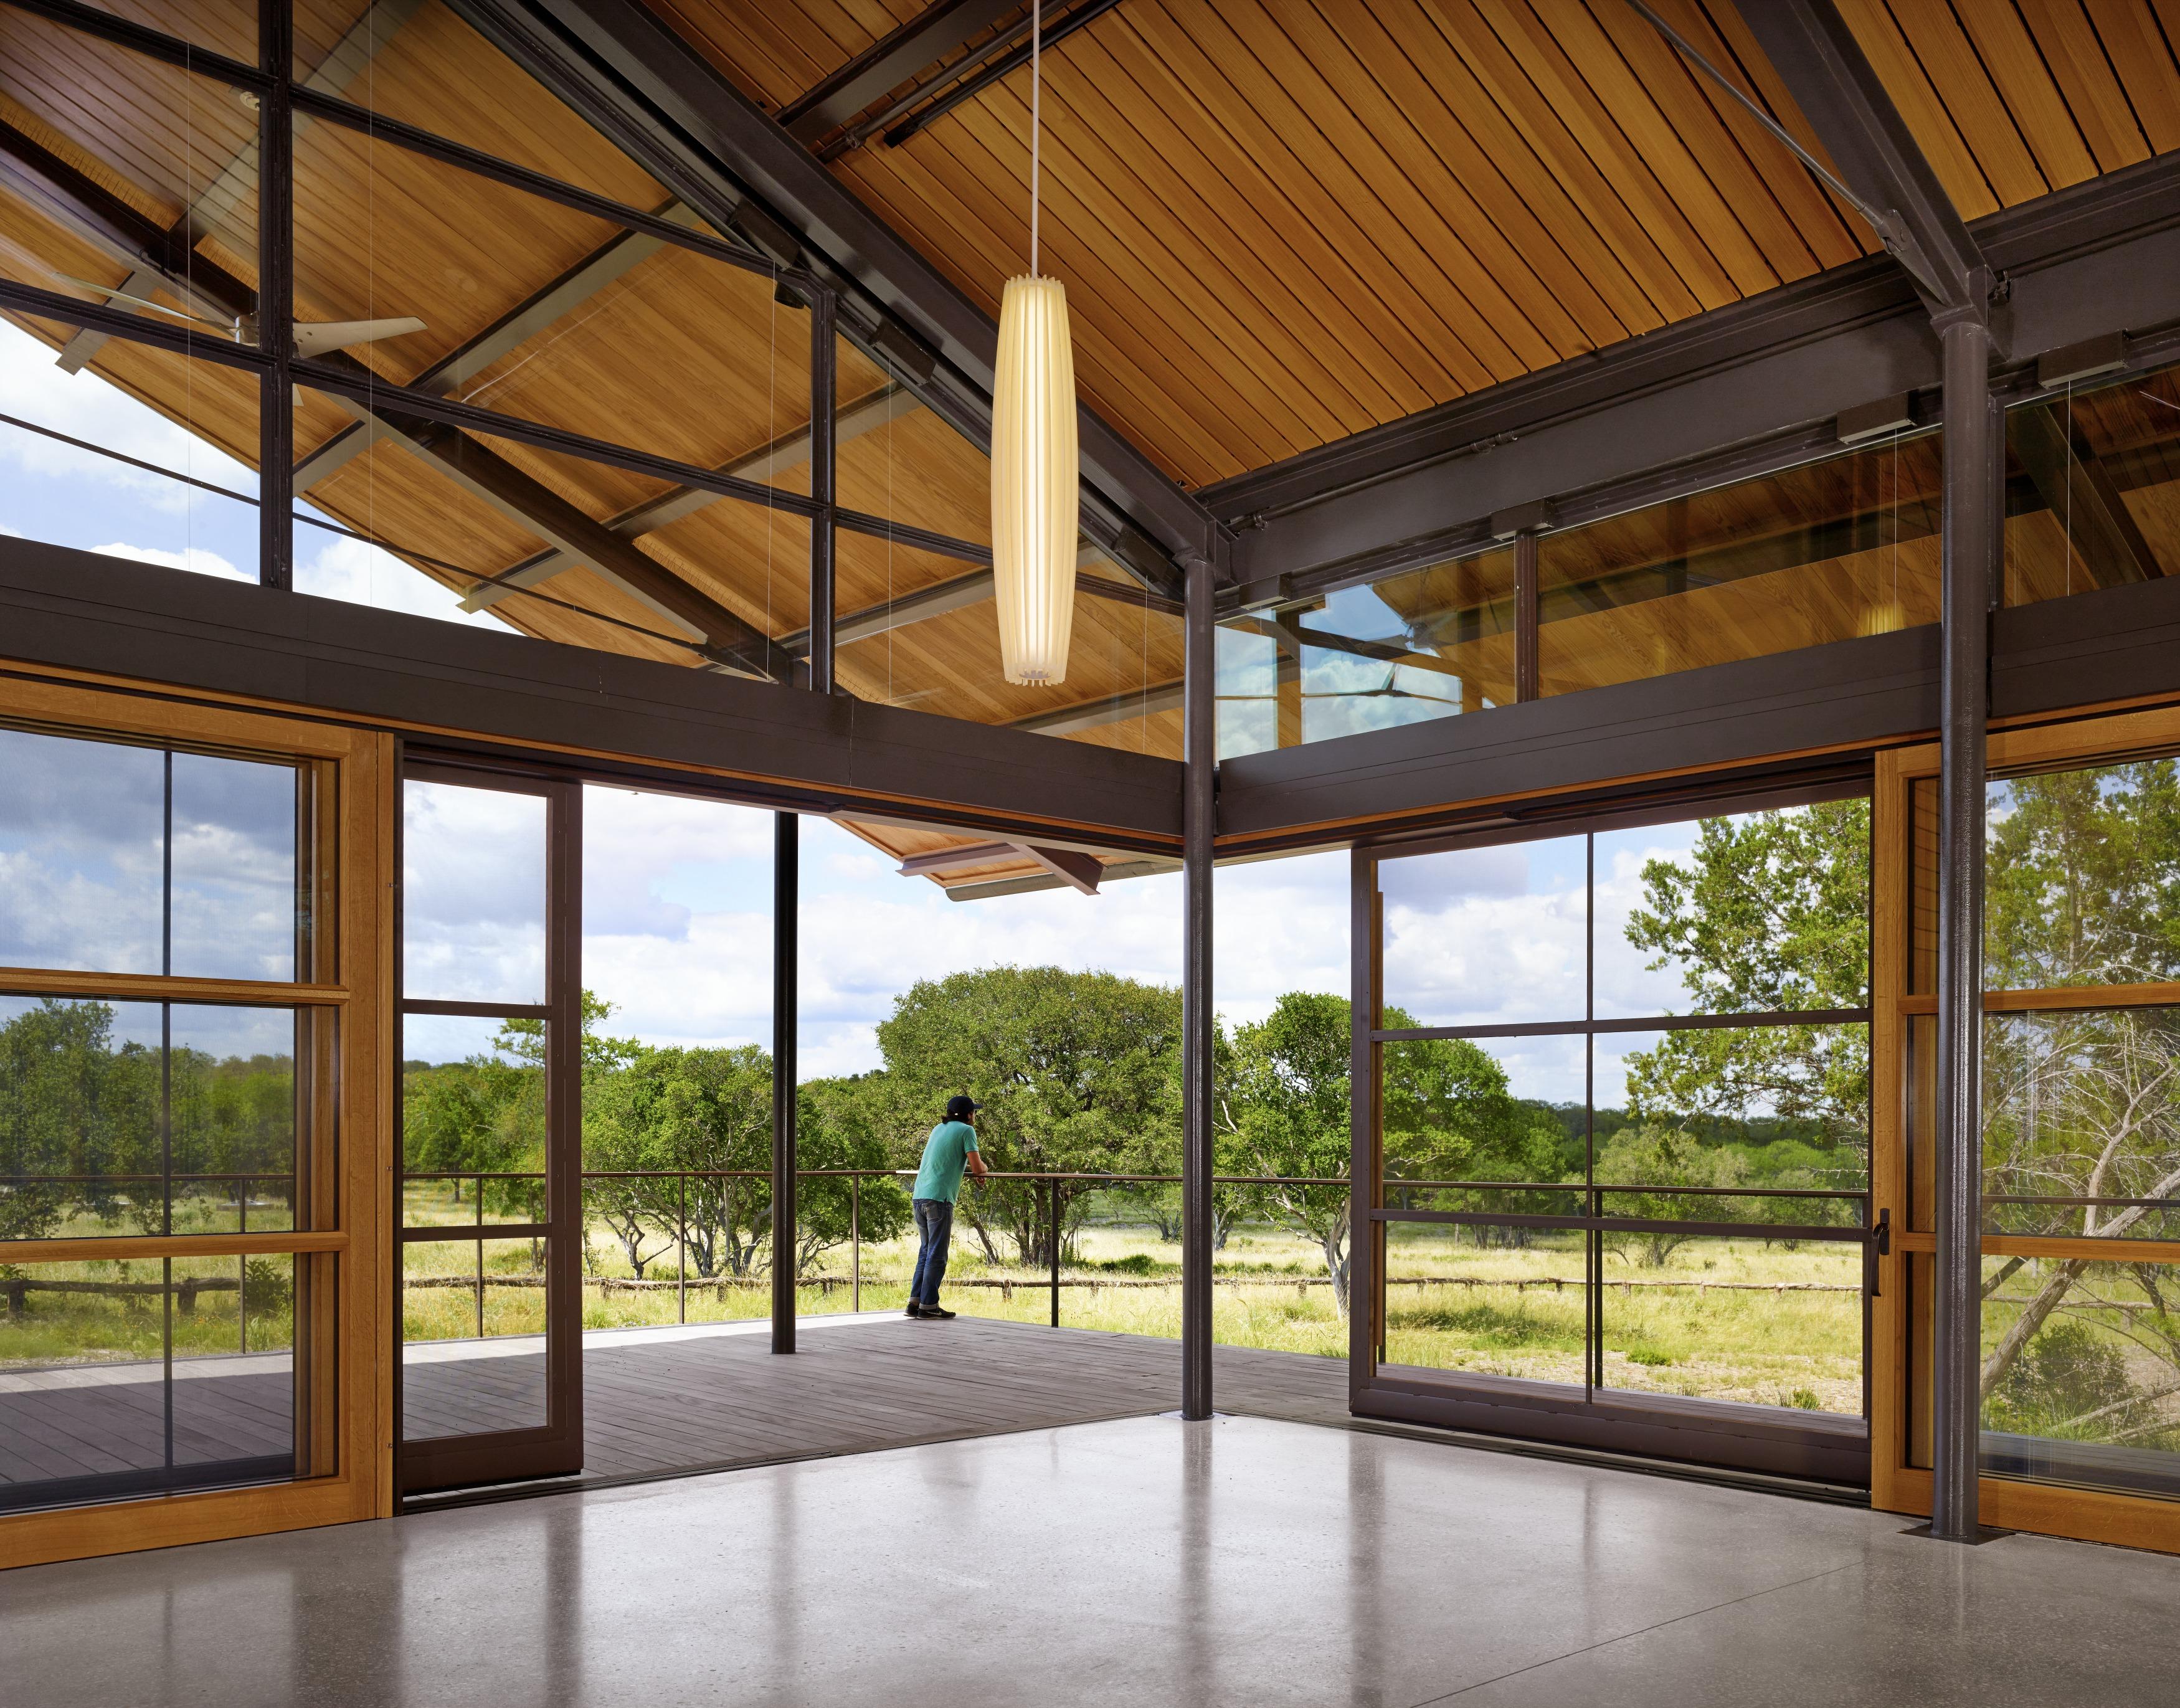 Phil Hardberger Park Urban Ecology Center | Lake Flato